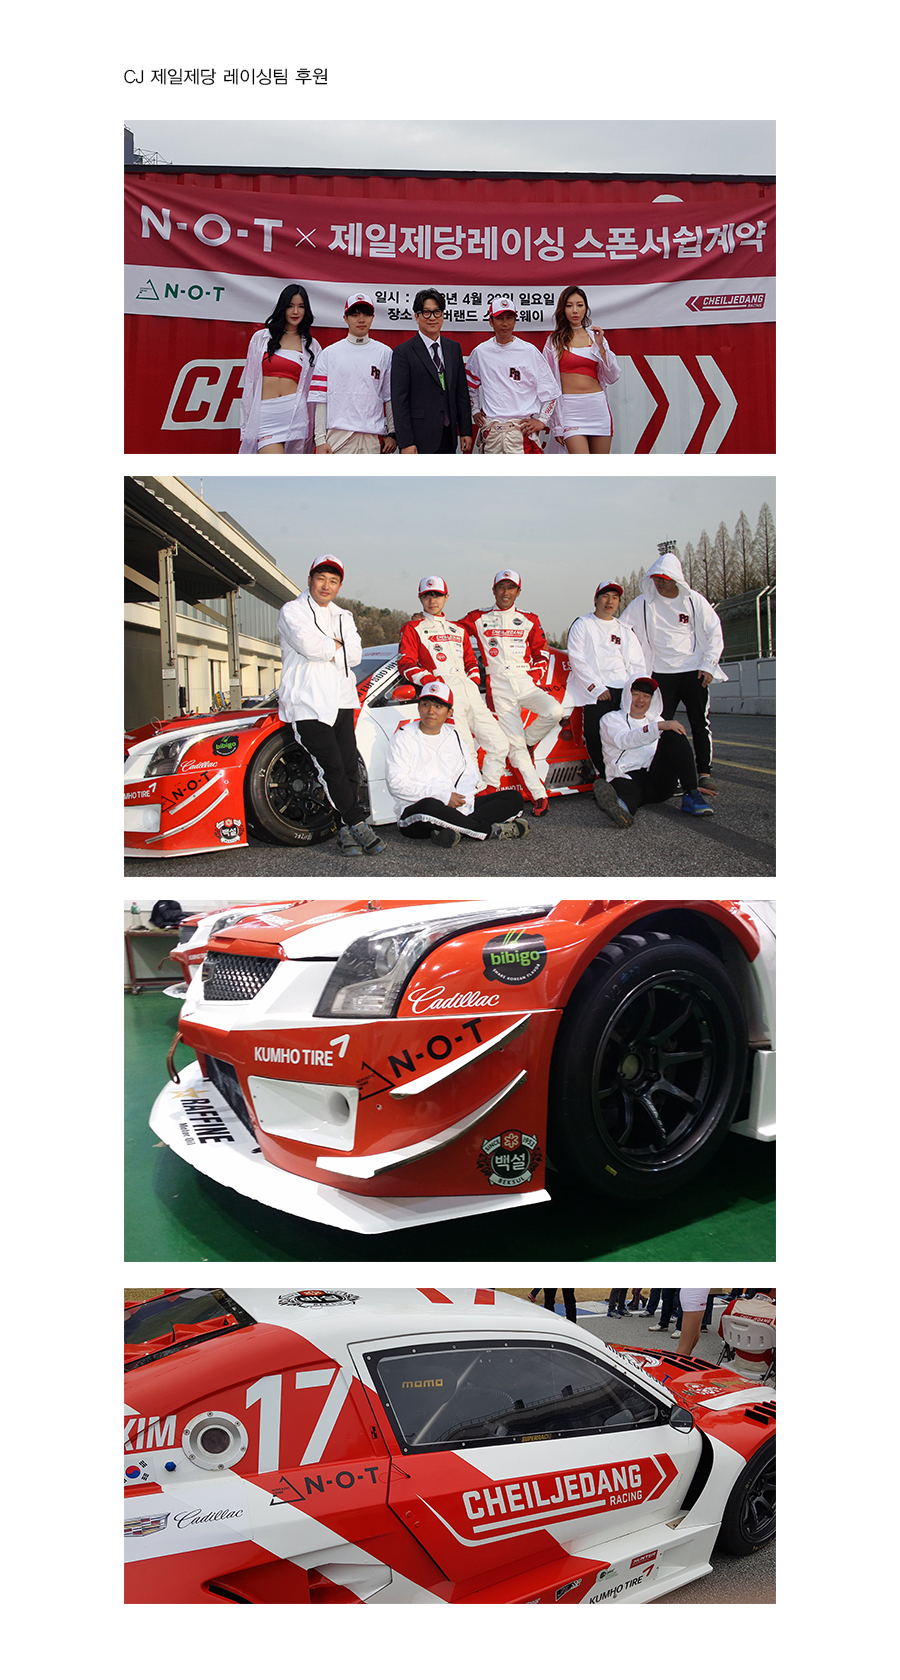 070-RED-LINE-T-SHIRT_02.jpg